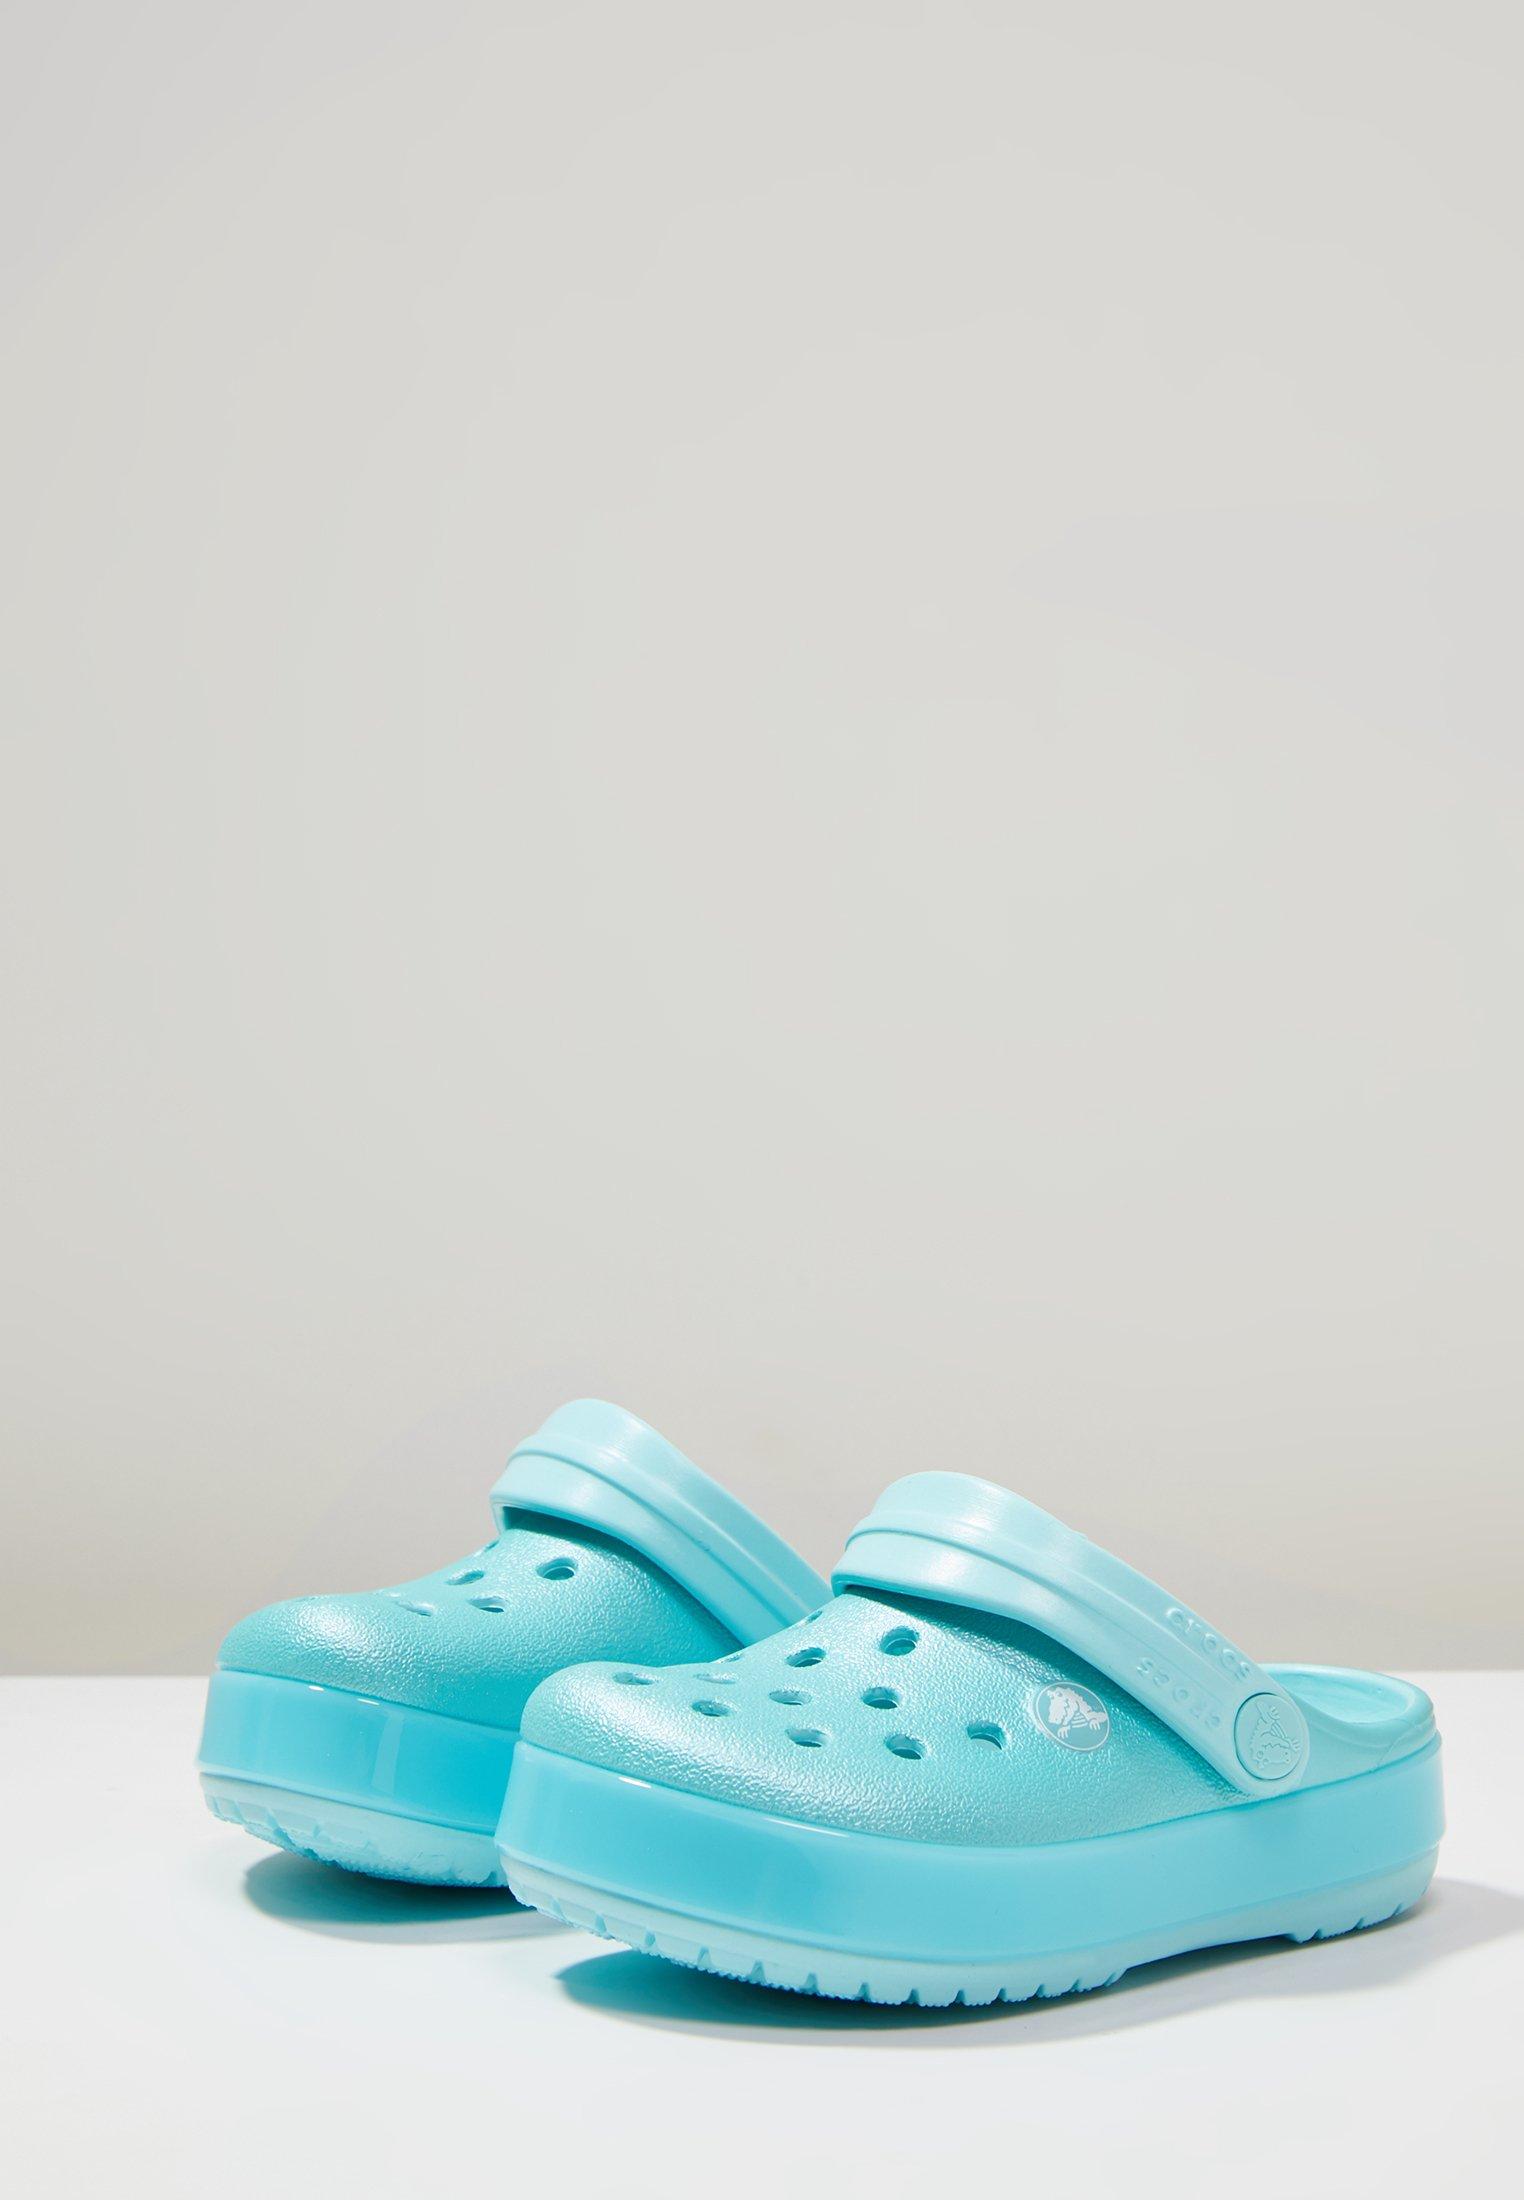 Kjøp Crocs Crocband Clog Kids Ice Blue sko Online | FOOTWAY.no